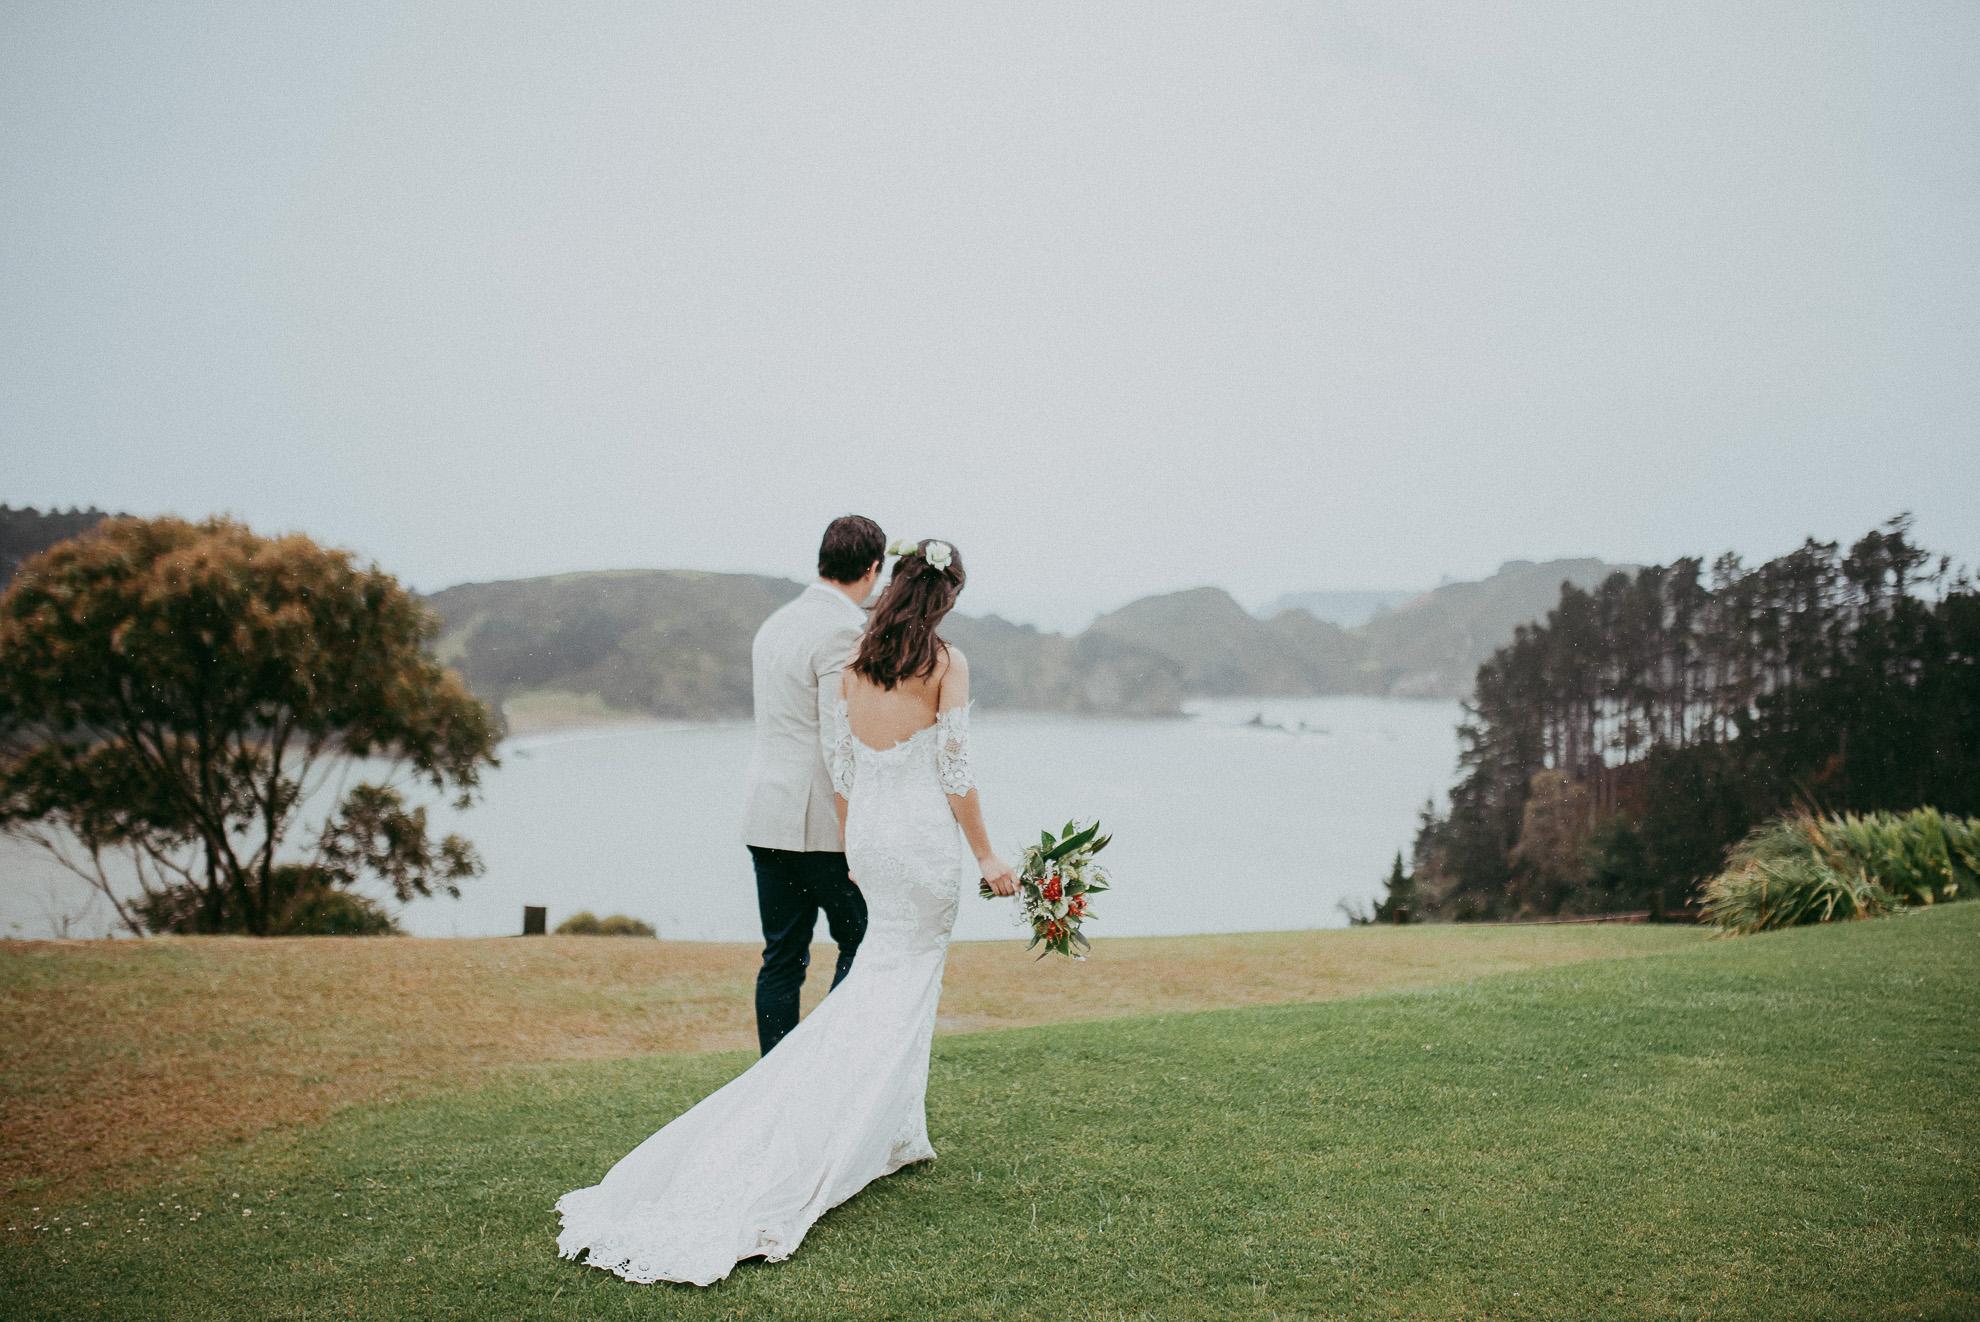 wedding-by-levien-577.JPG